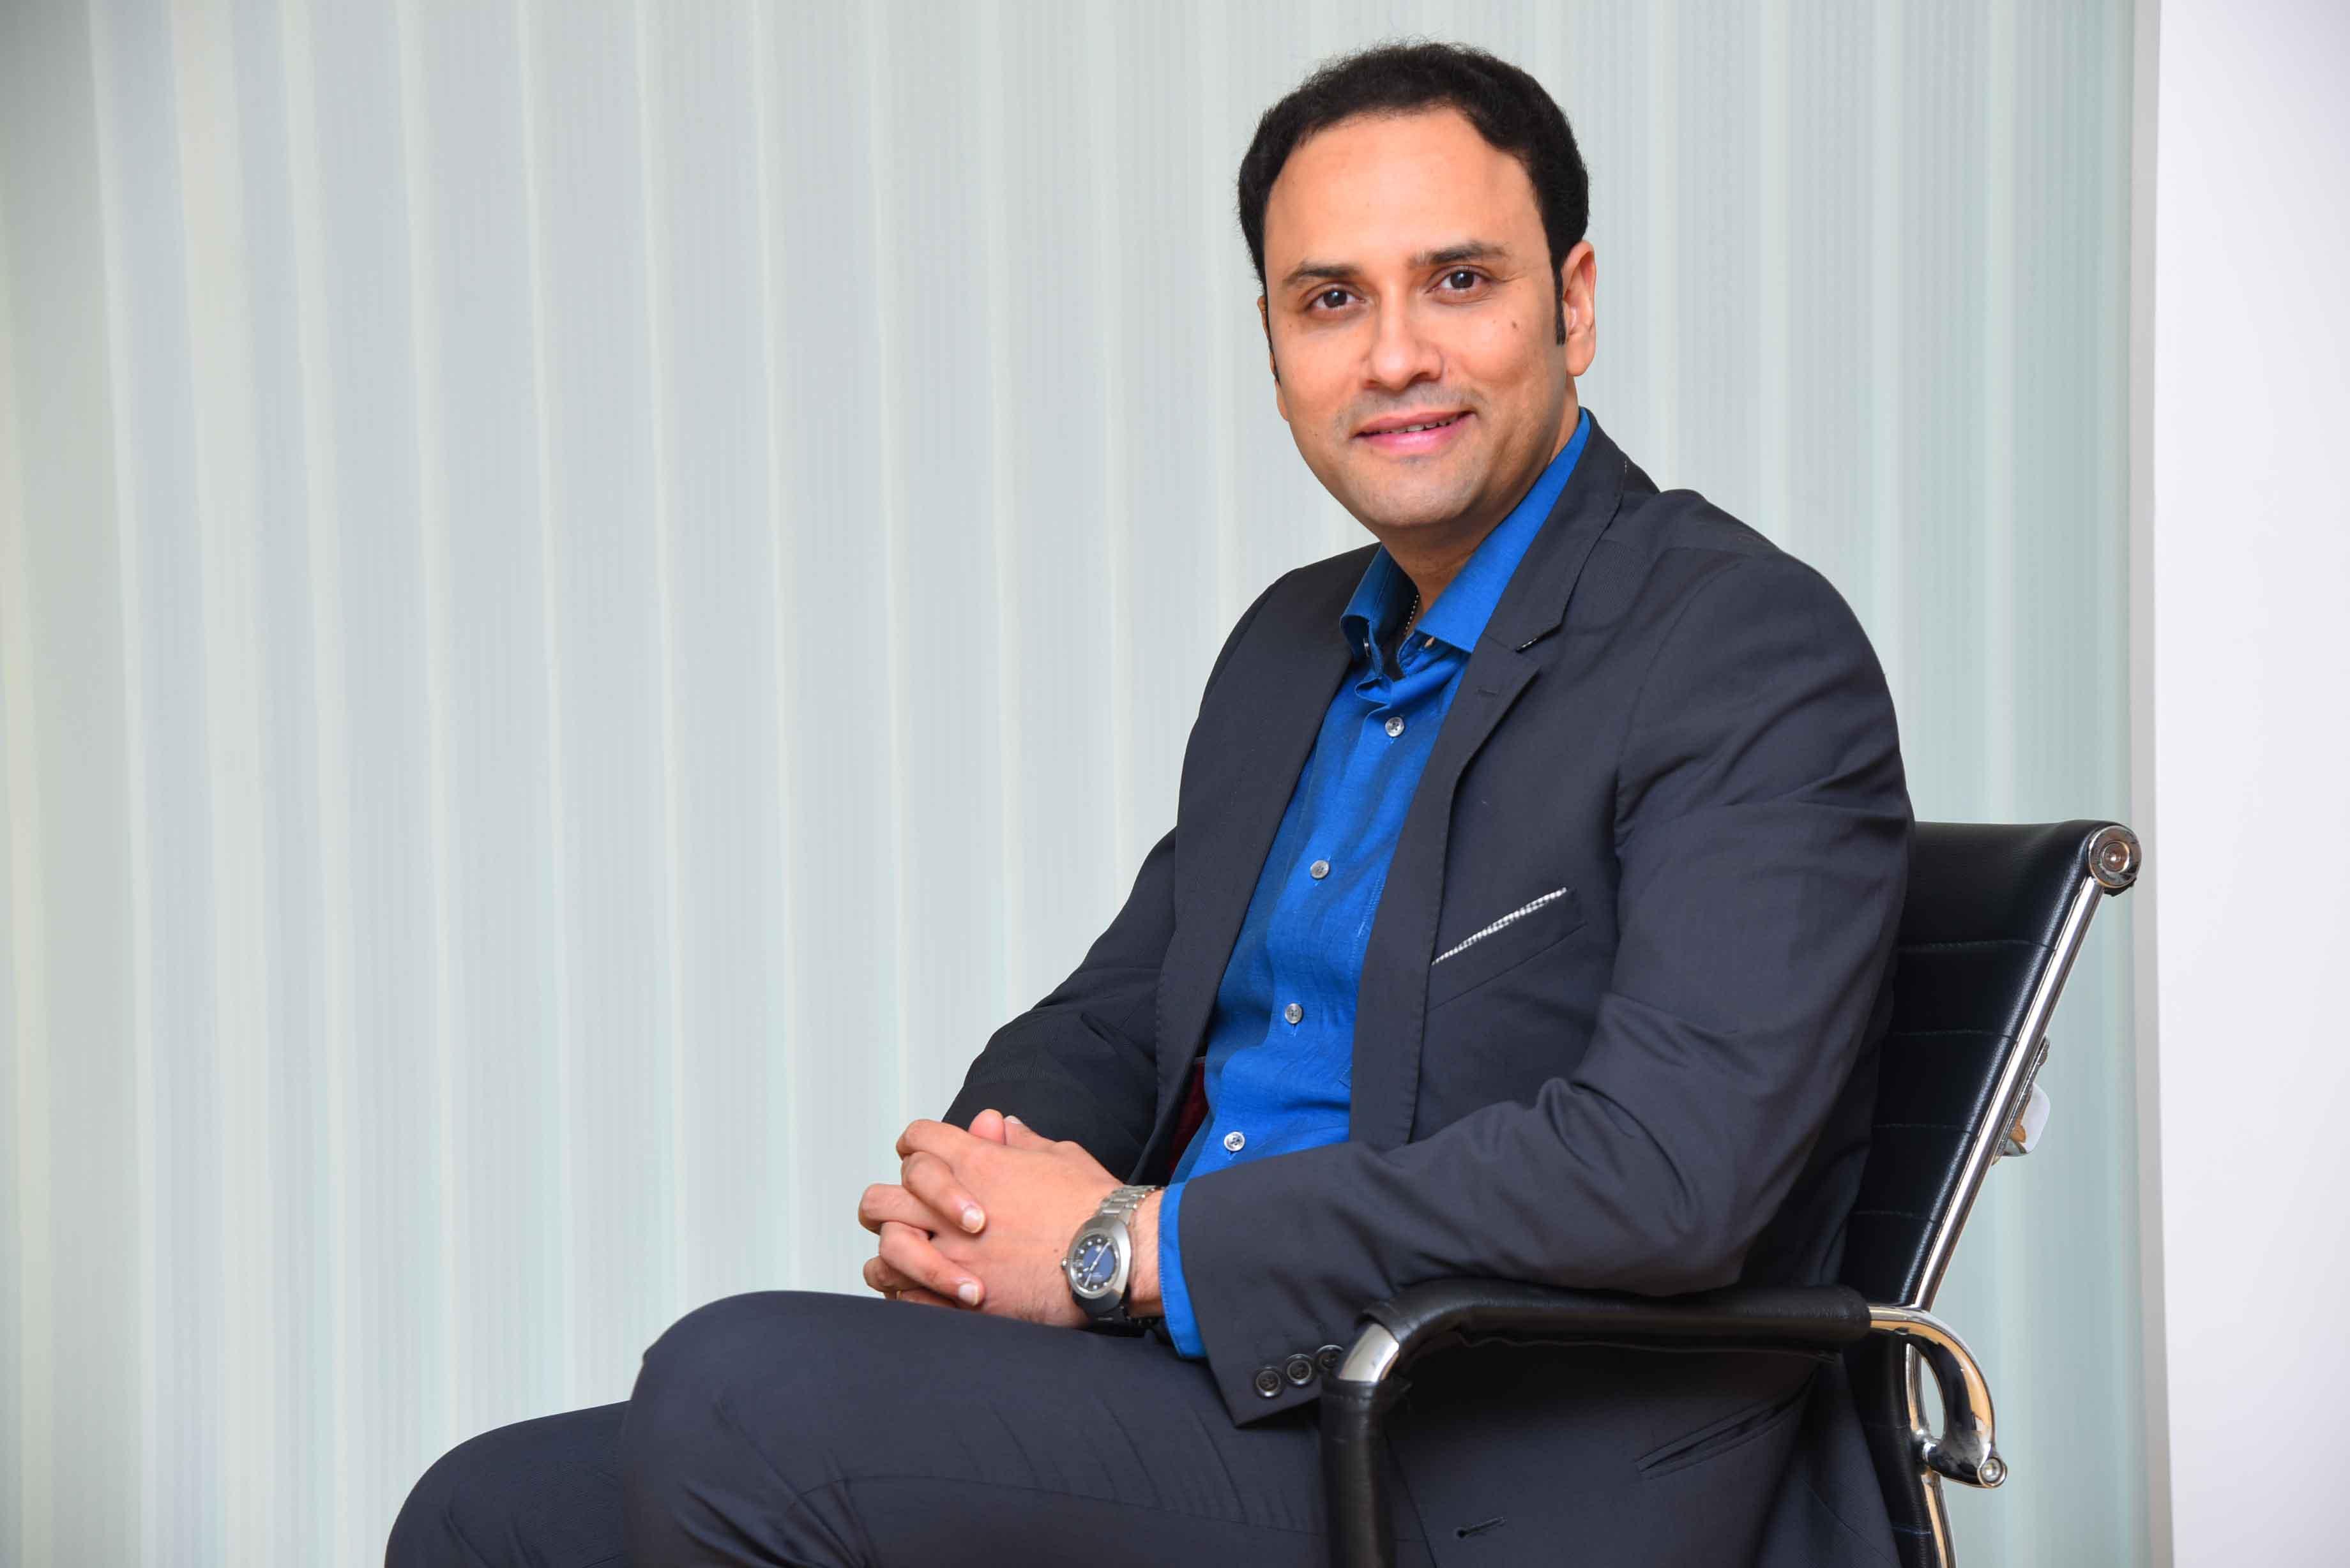 Akash Banerji